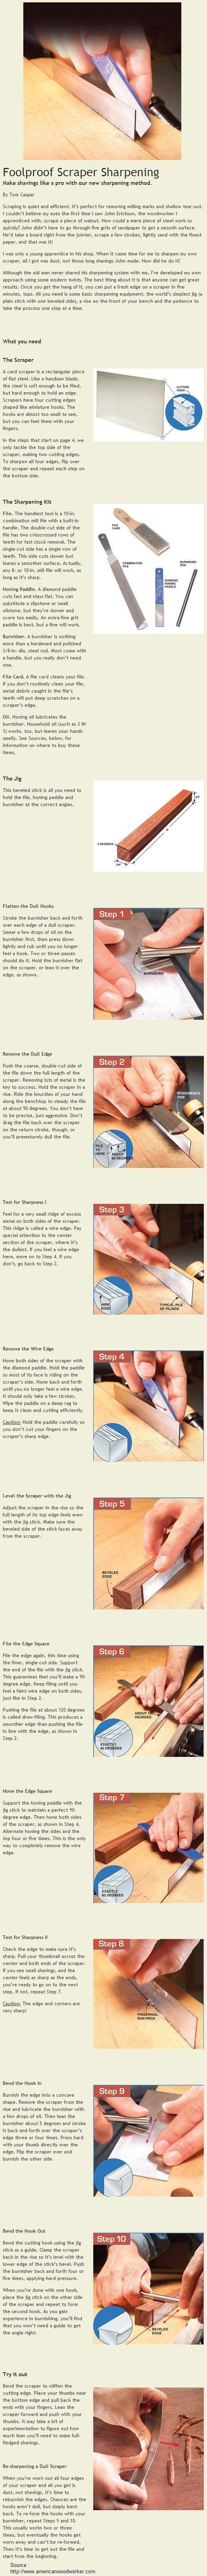 Foolproof Scraper Sharpening